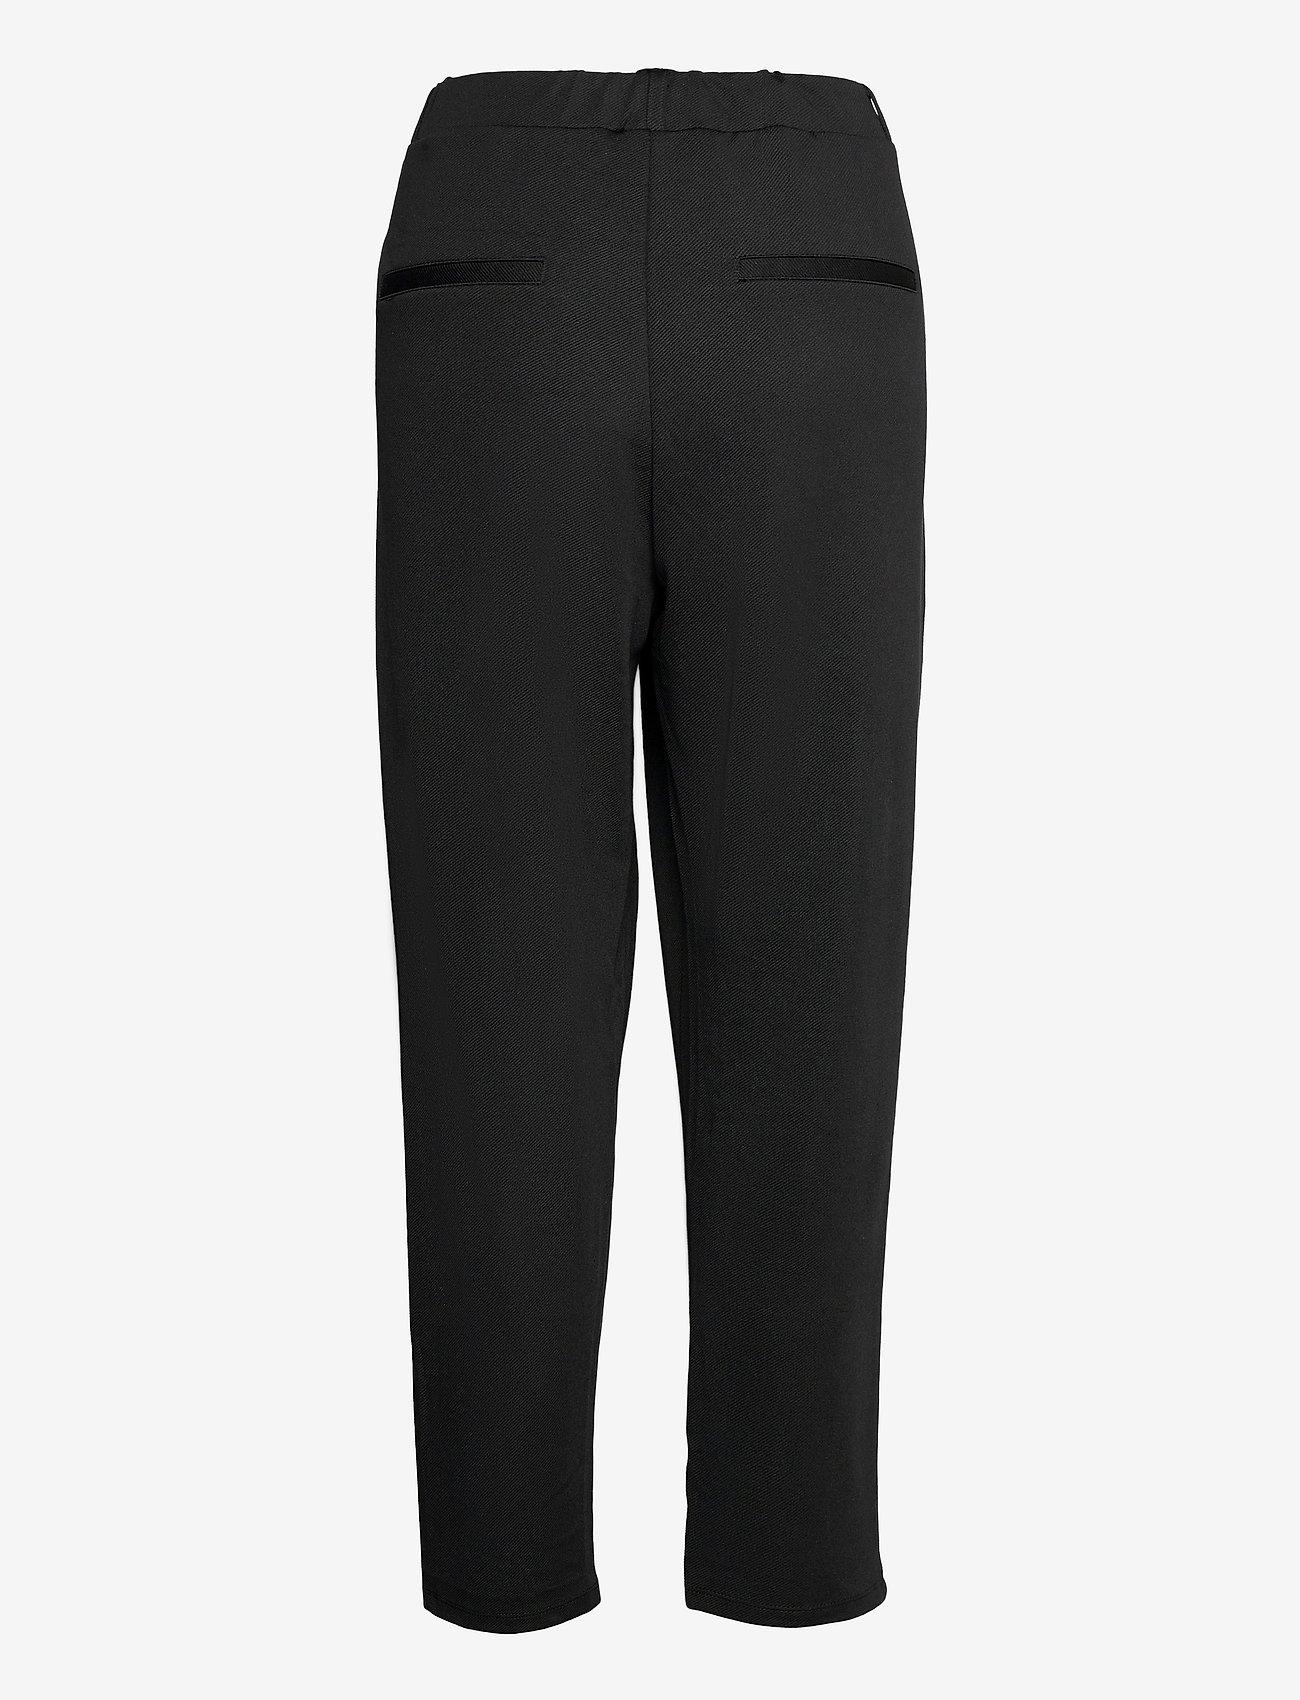 Lindex - Trousers Karin twill - pantalons droits - black - 1